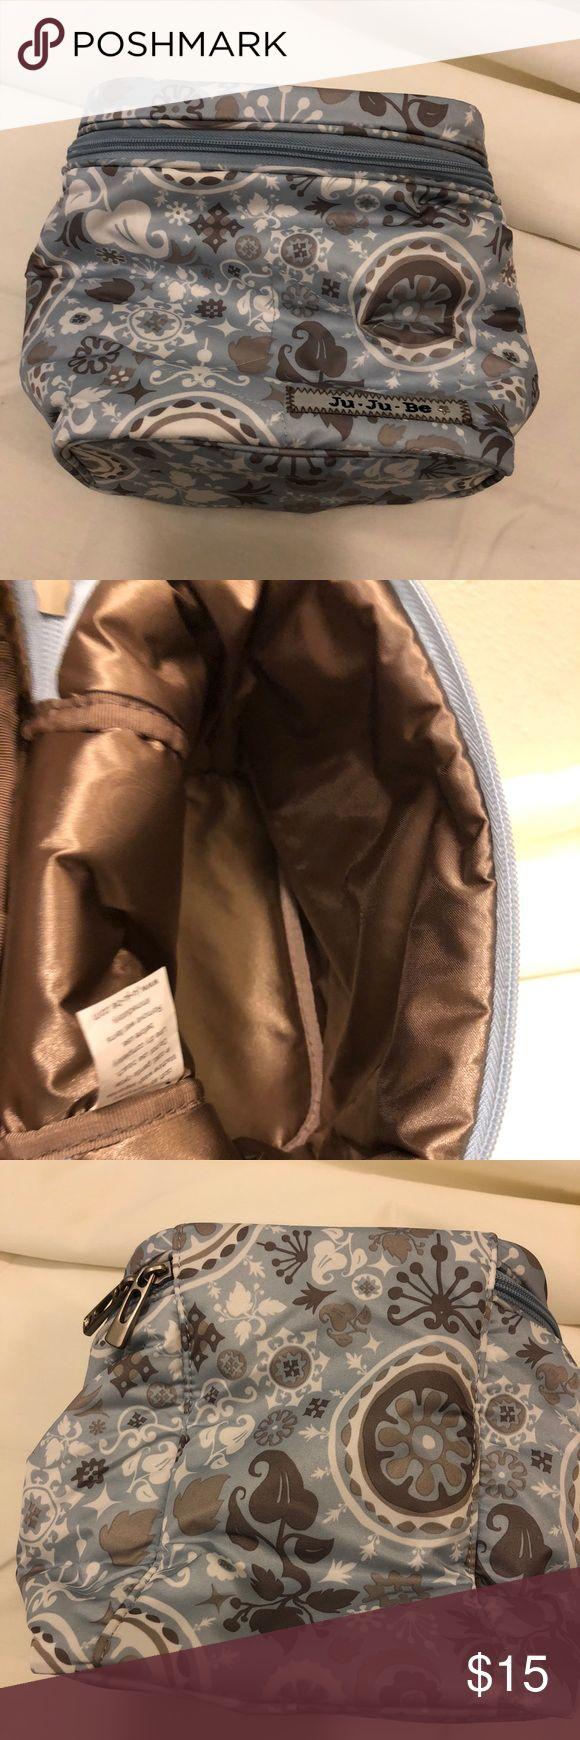 JuJube fuel cell JuJube fuel cell jujube Bags Baby Bags